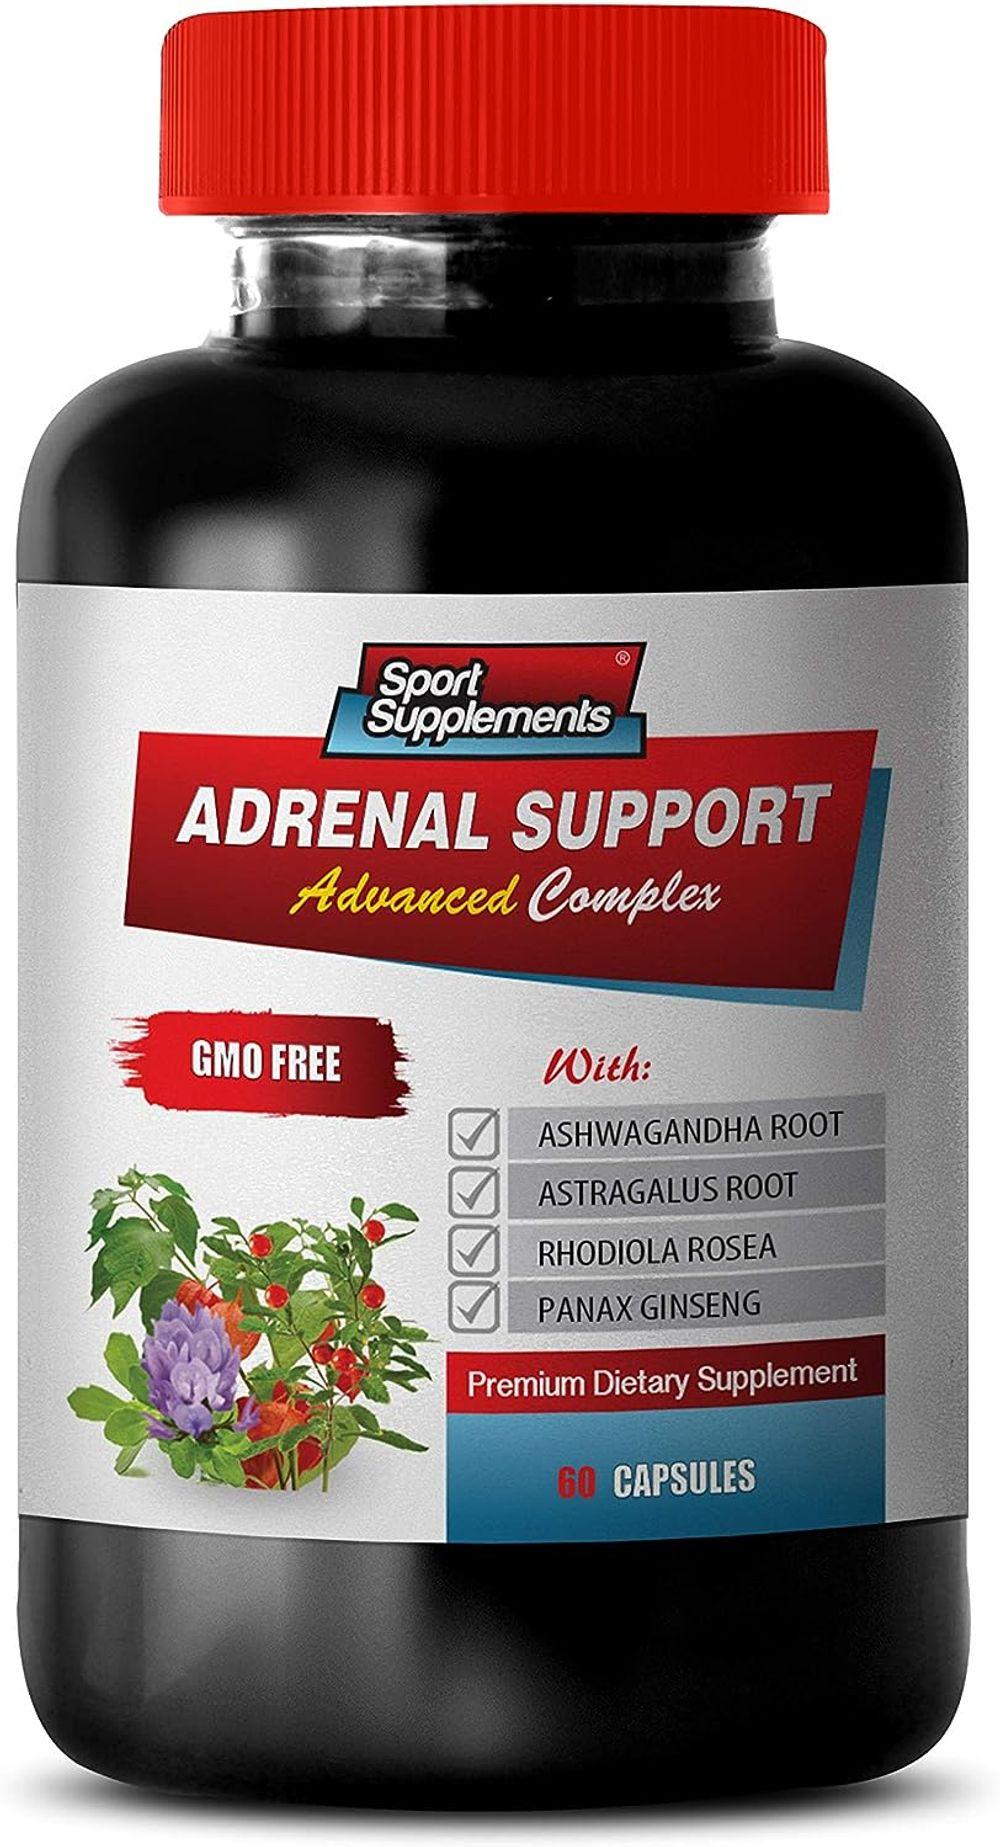 Brain Health Supplement rhodiola - Adrenal Support - GMO Free - Advanced Complex - Premium Dietary Supplement - panax Ginseng for Women - 1 Bottle 60 Capsules